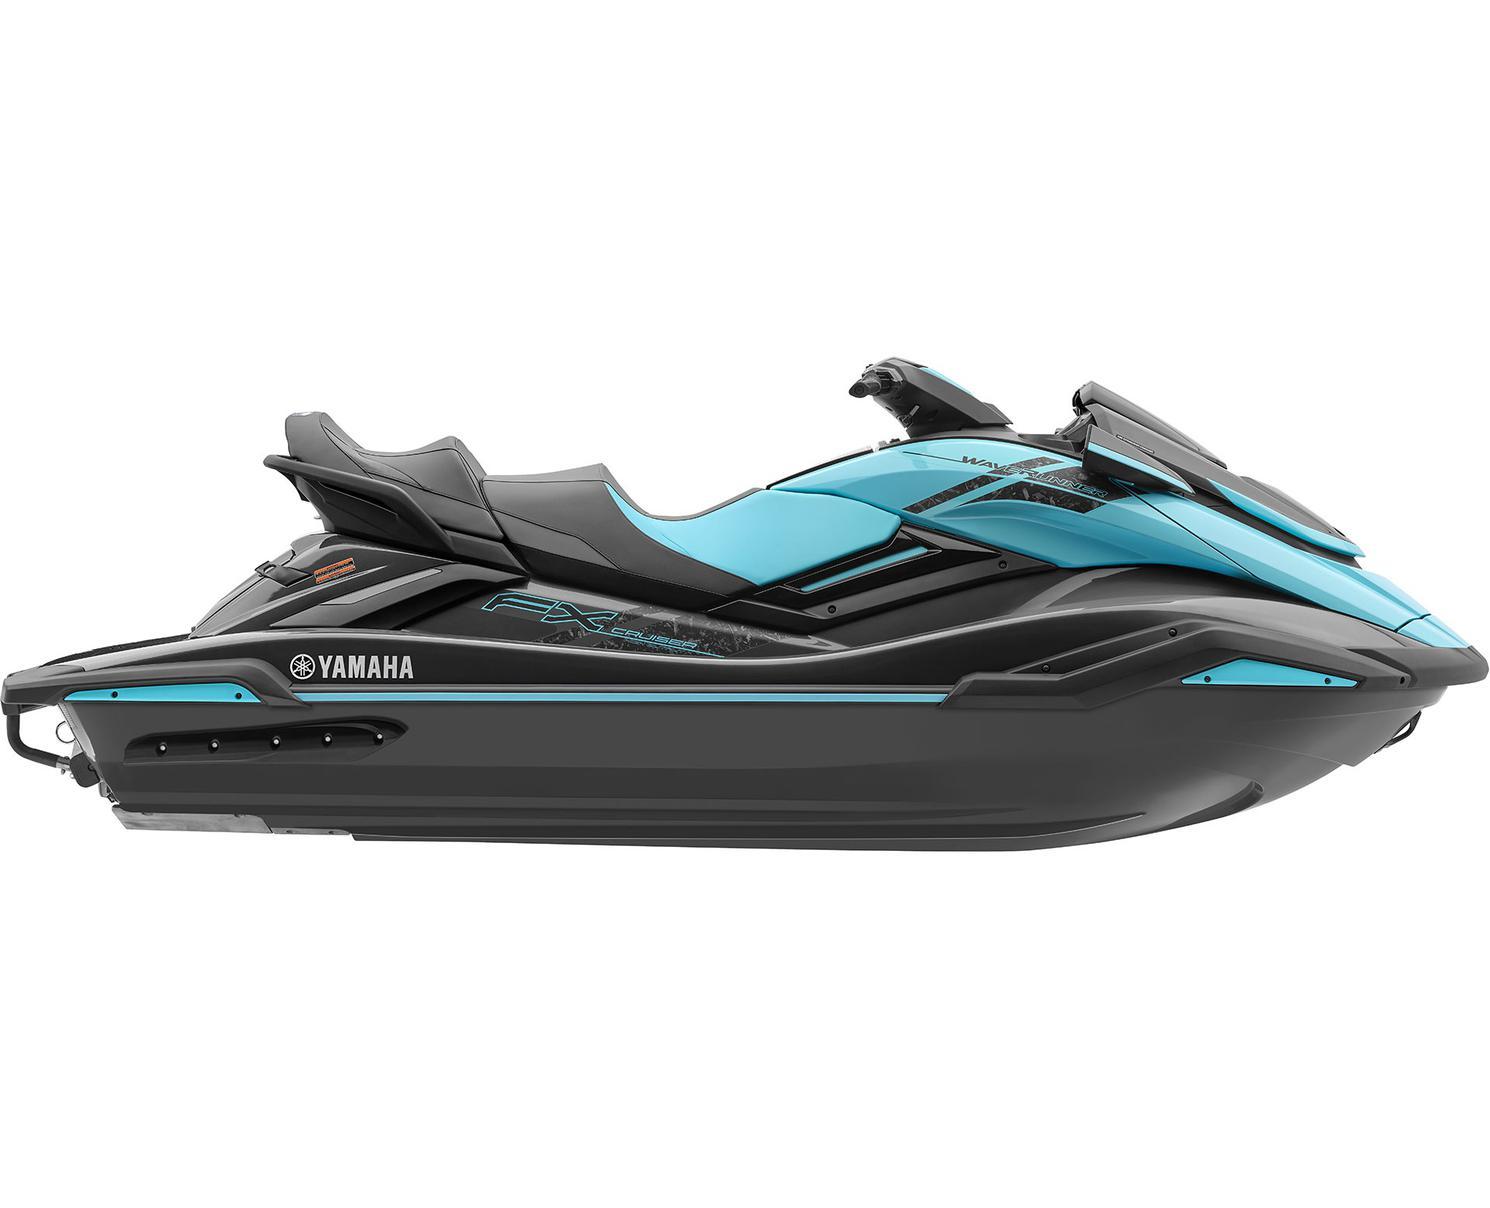 2022 Yamaha FX Cruiser HO Carbon/Mint